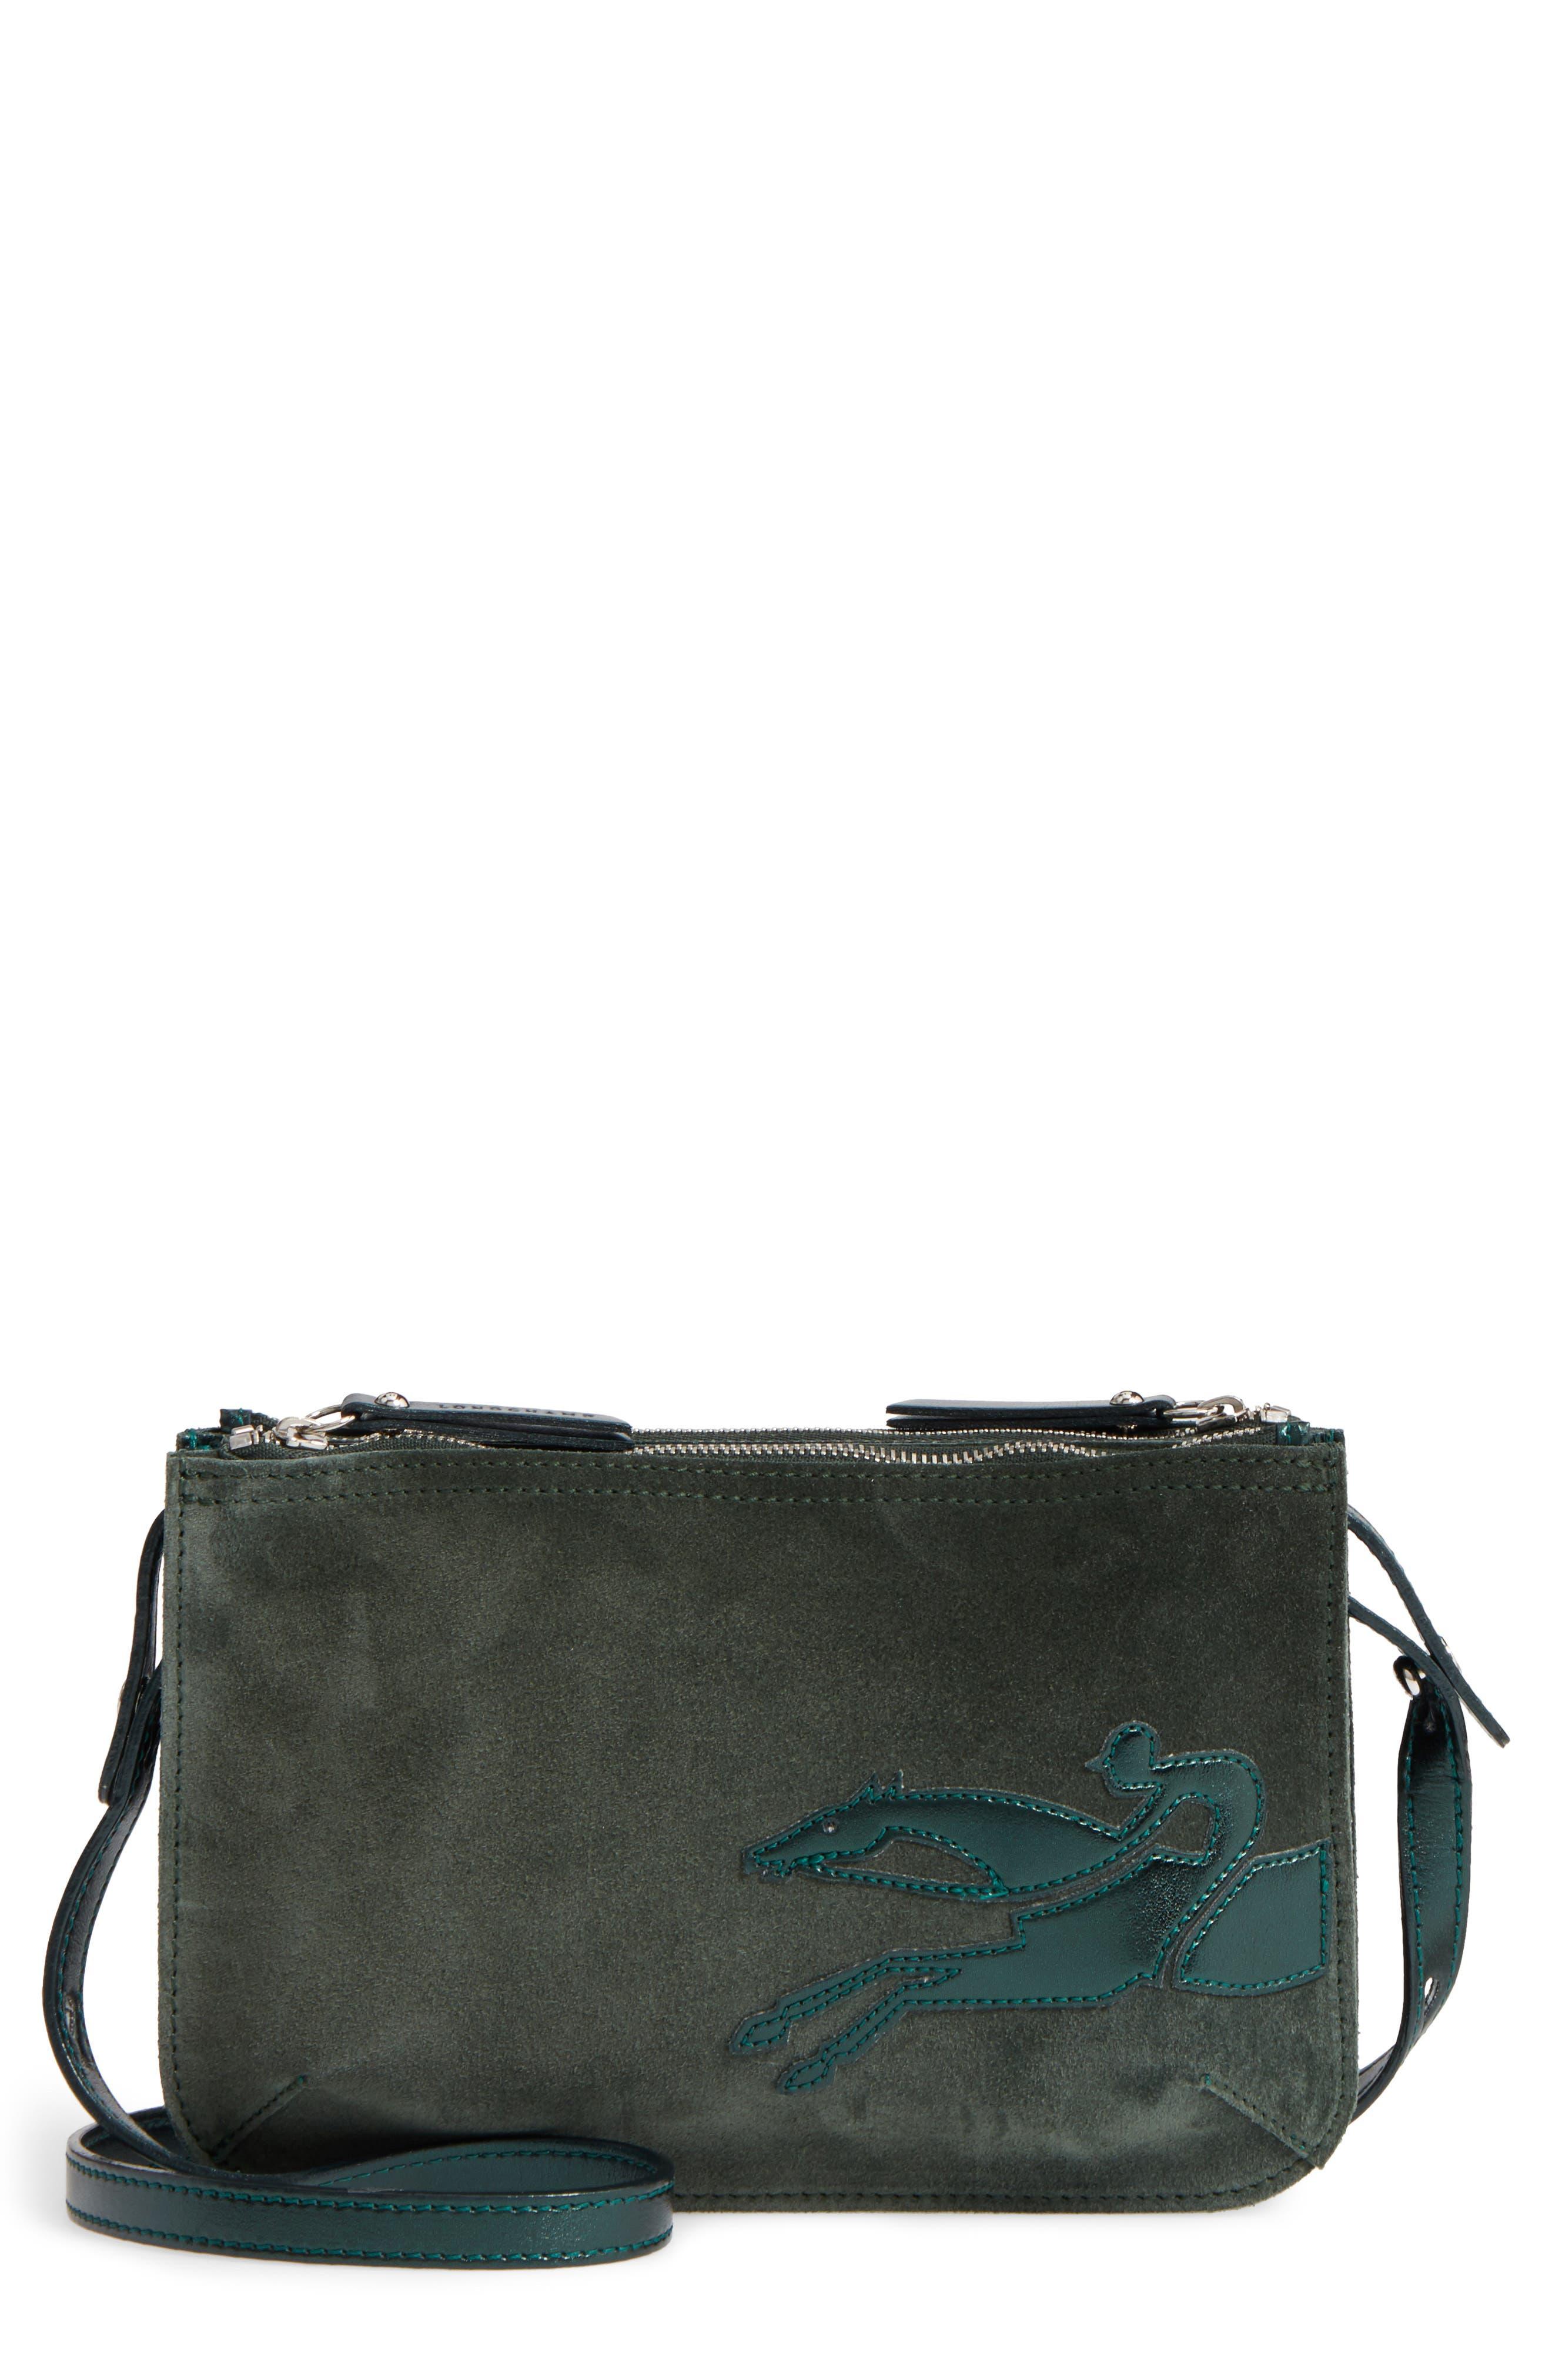 Alternate Image 1 Selected - Longchamp Shop It Crossbody Bag